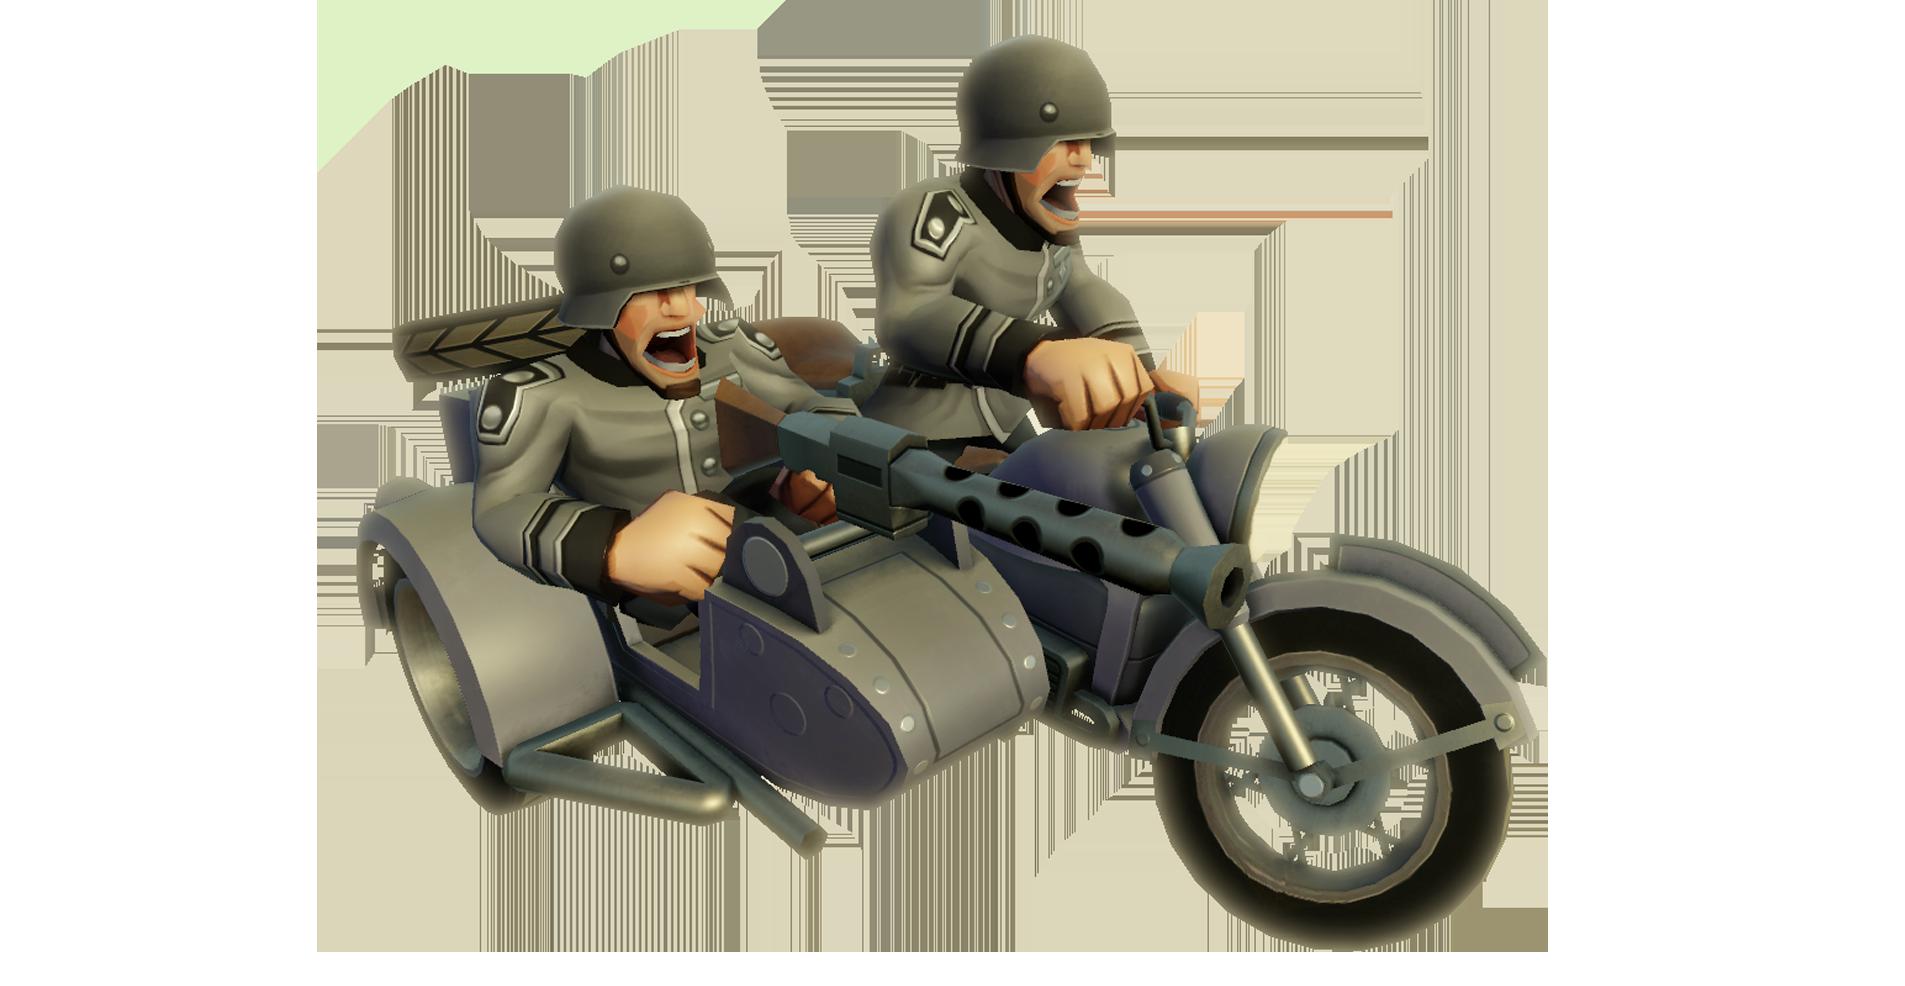 GER Motorcycle Sidecar